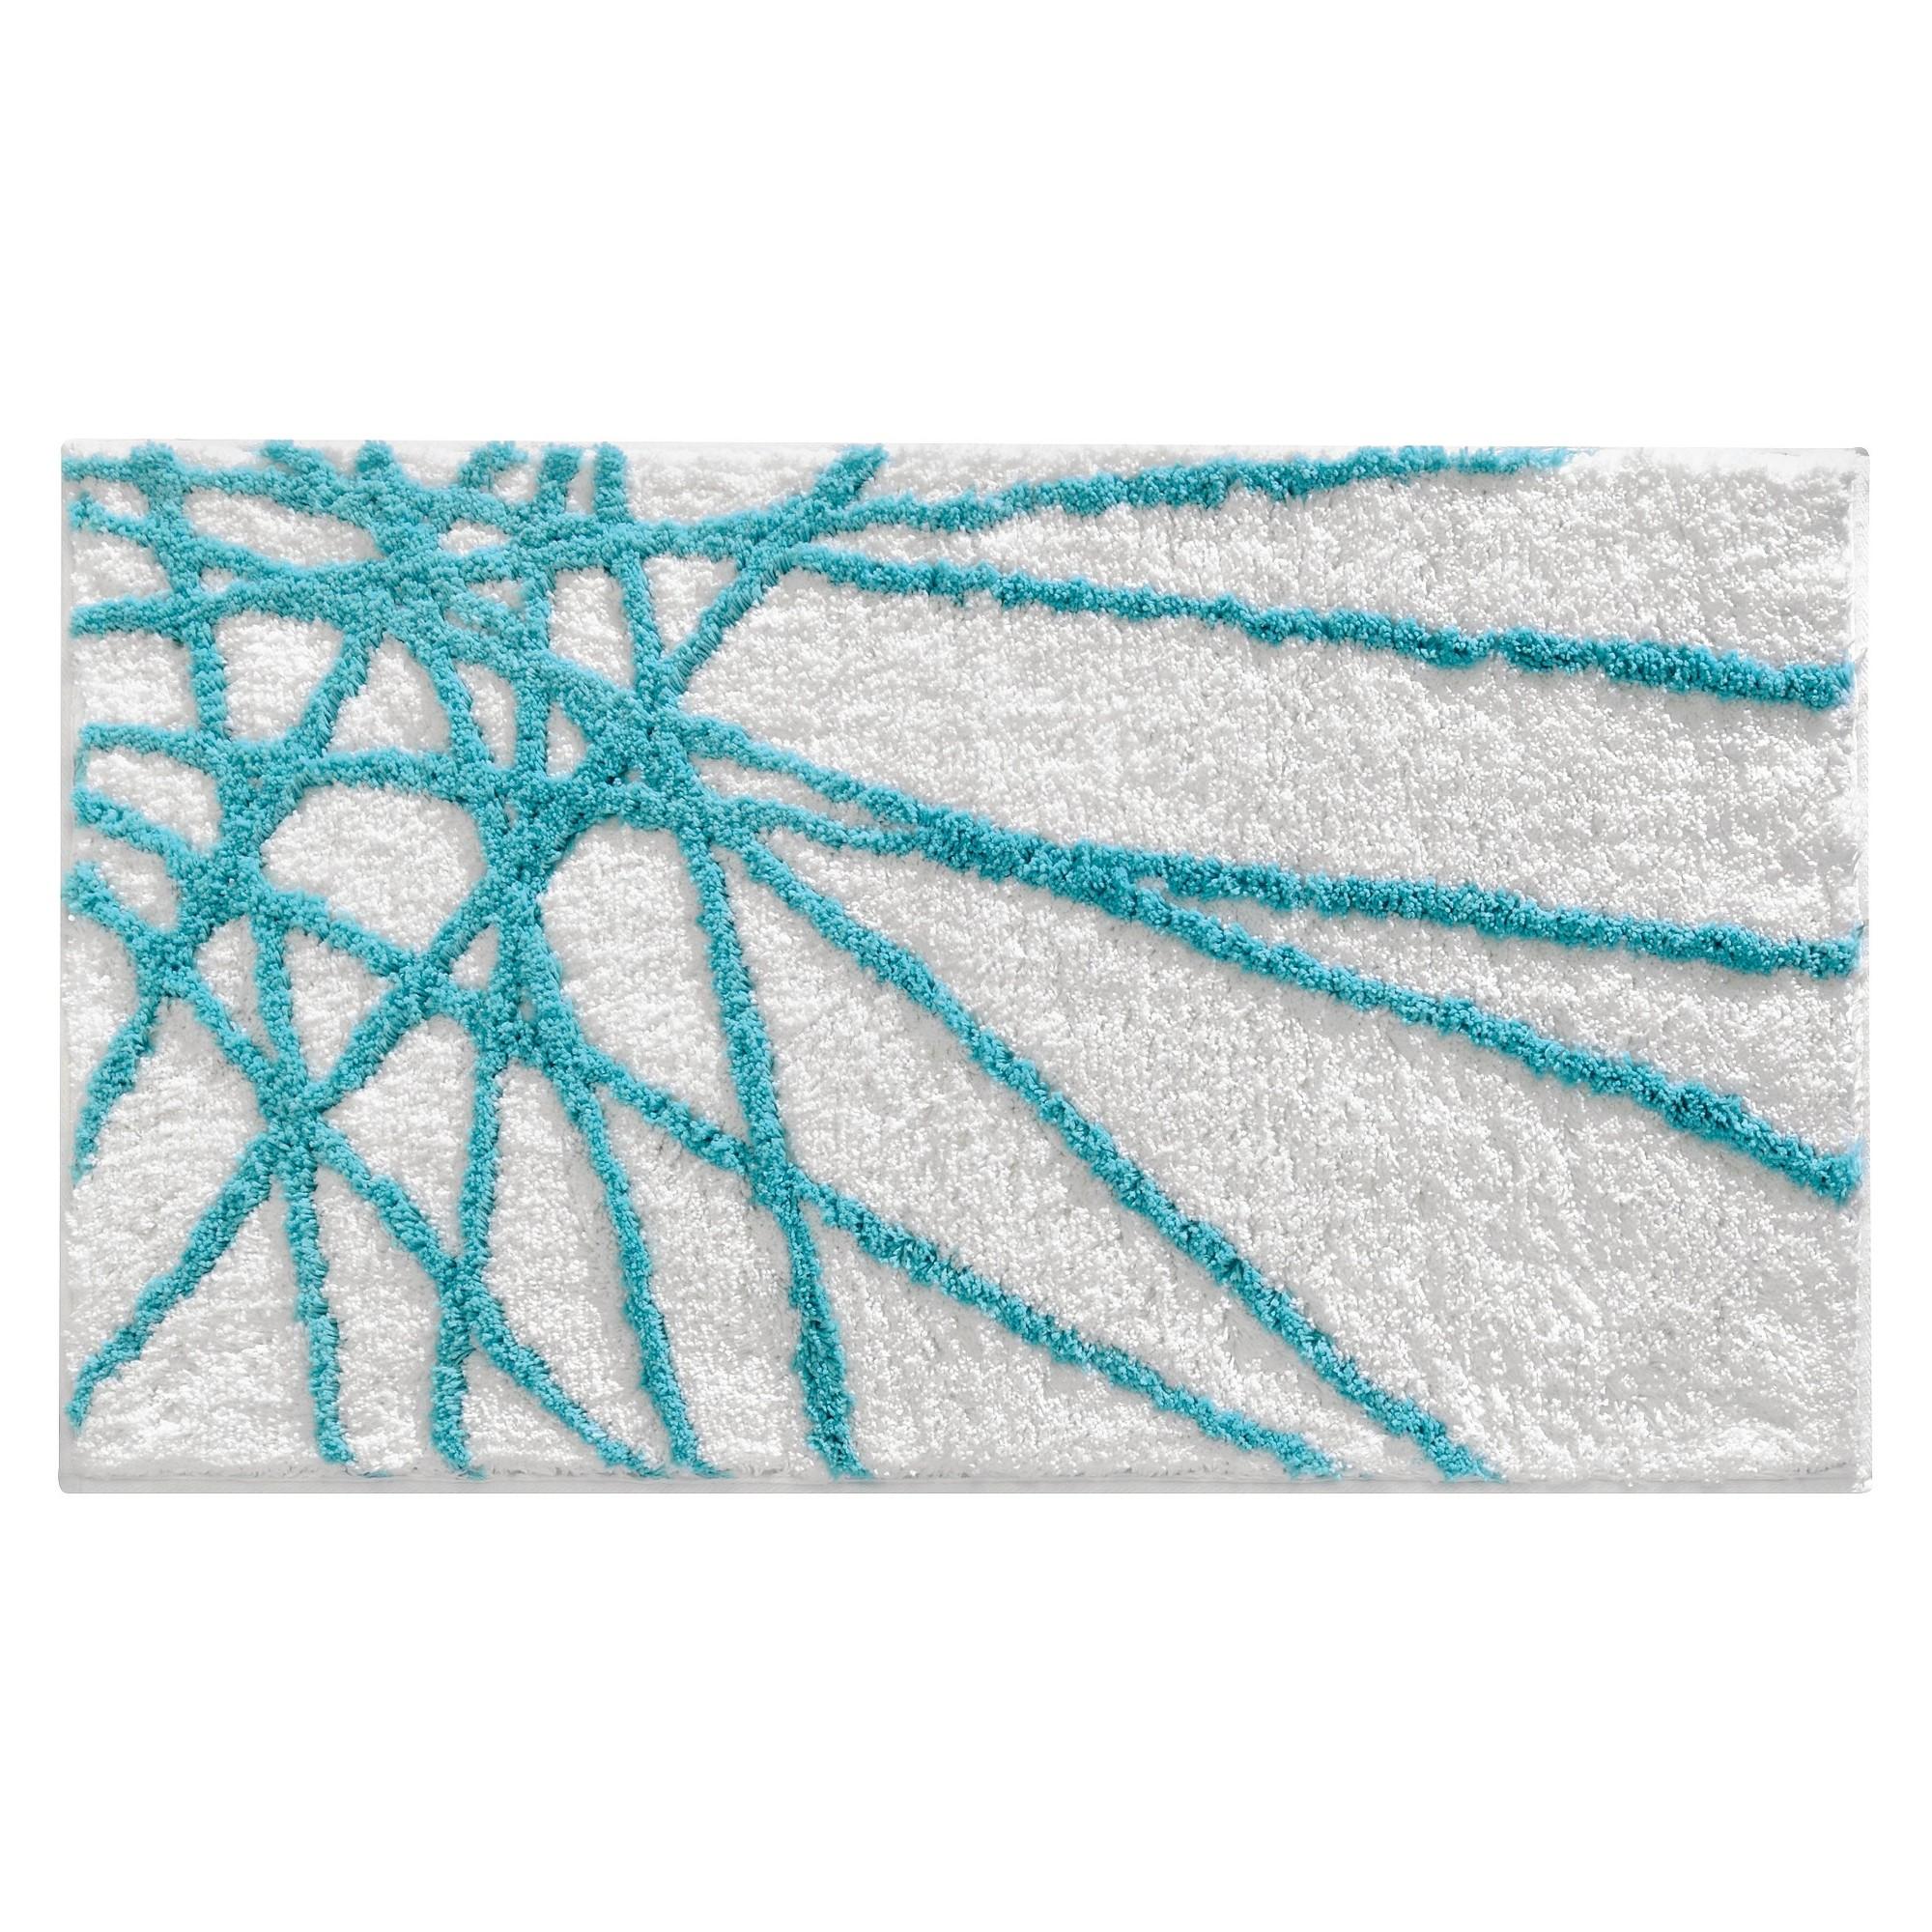 Abstract Rug Aqua White Blue White Interdesign Abstract Rug Teal Bath Rugs Bath Rug [ 2000 x 2000 Pixel ]